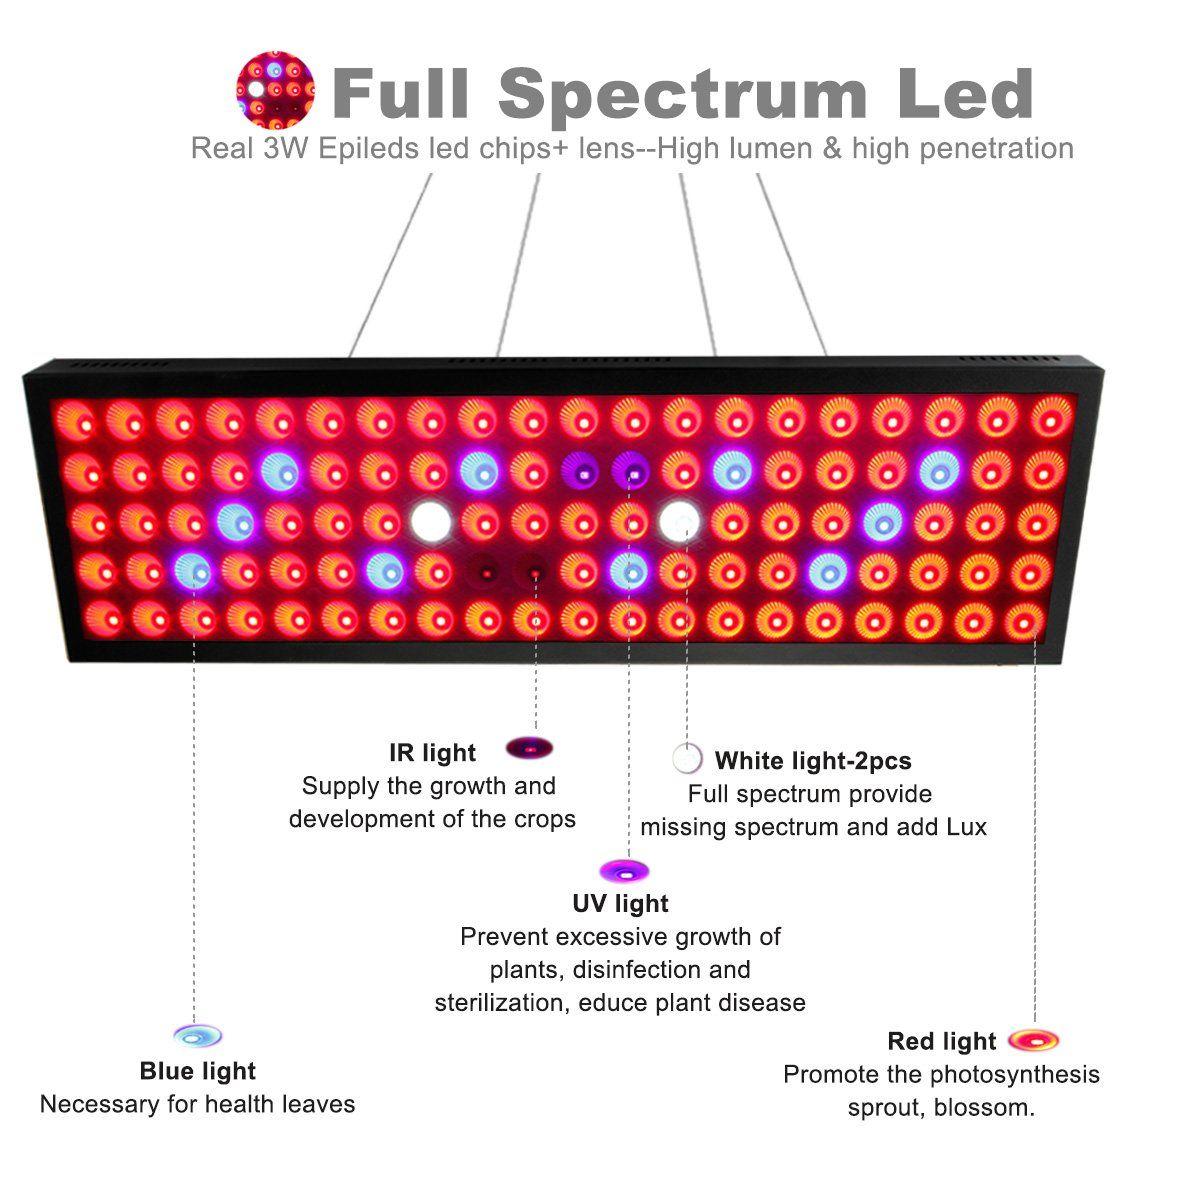 Exmate 300w Led Grow Light Full Spectrum Plant Light For Indoor Plants Growing Lamp Bulbs With Uv And Ir Growing Plants Indoors Led Grow Lights Plant Lighting